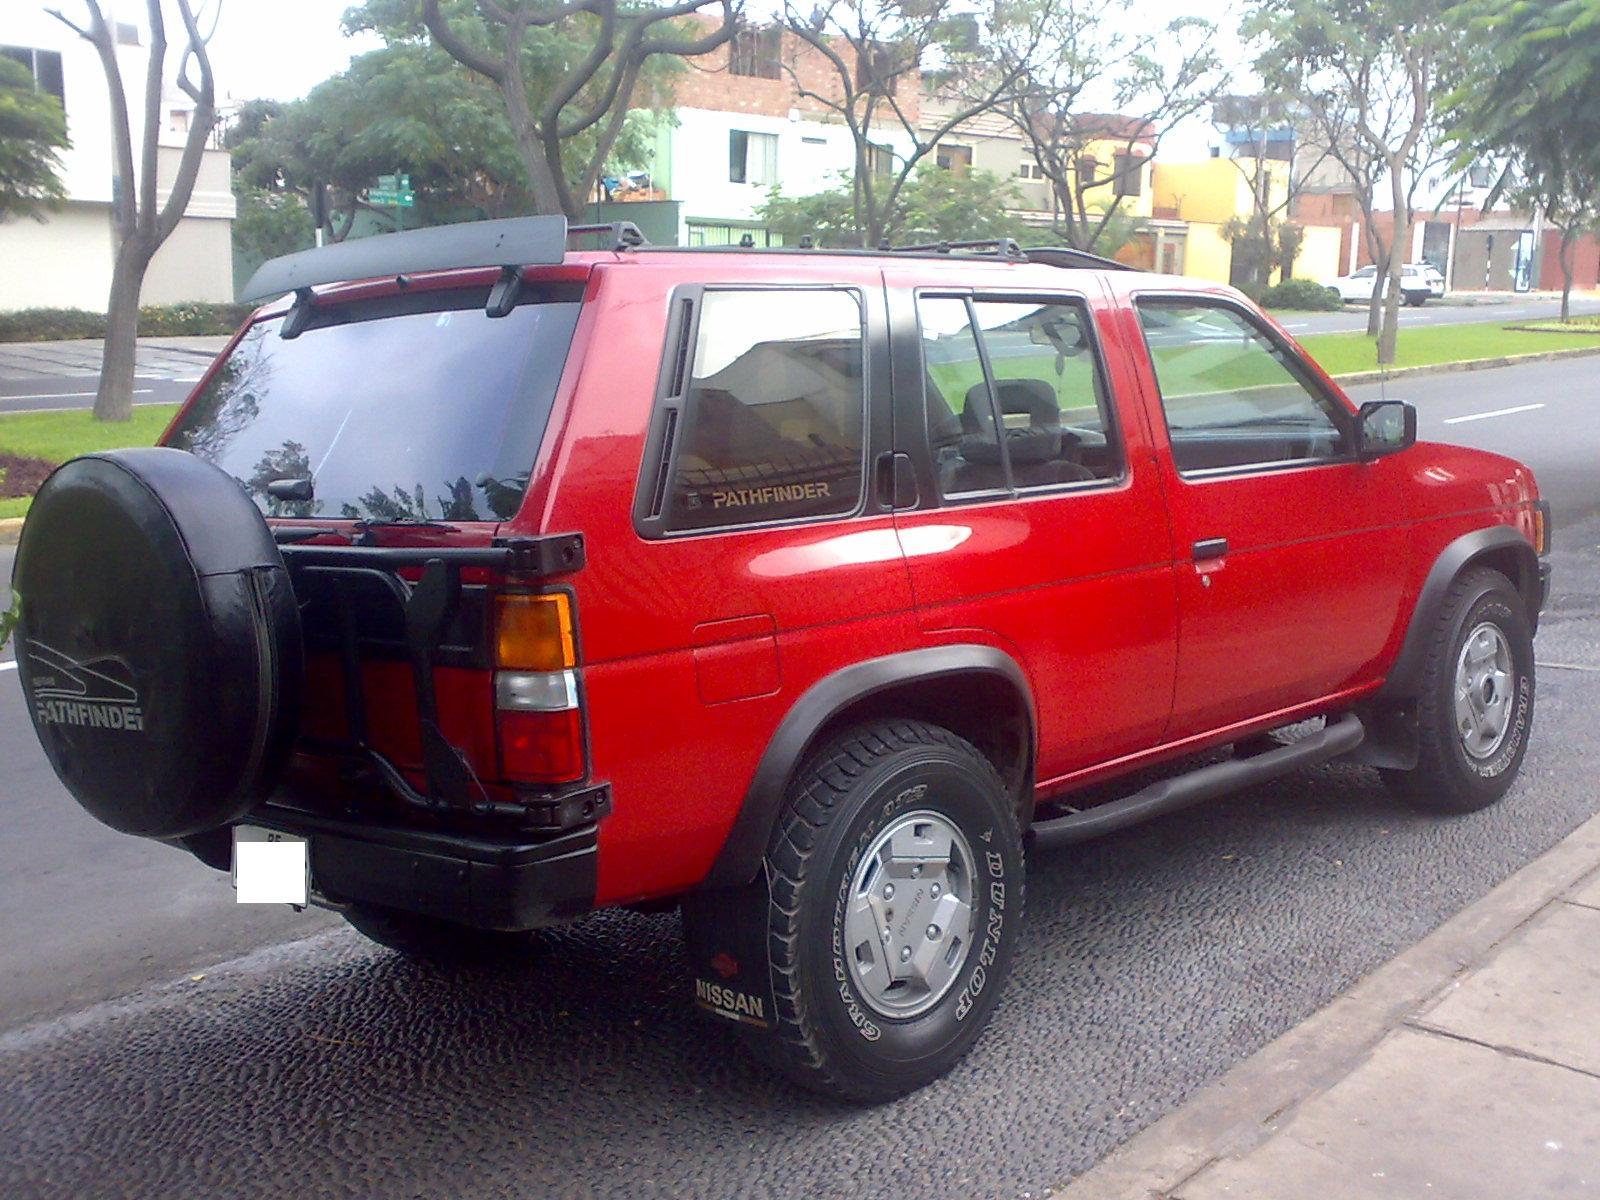 1991 Nissan Pathfinder Image 8